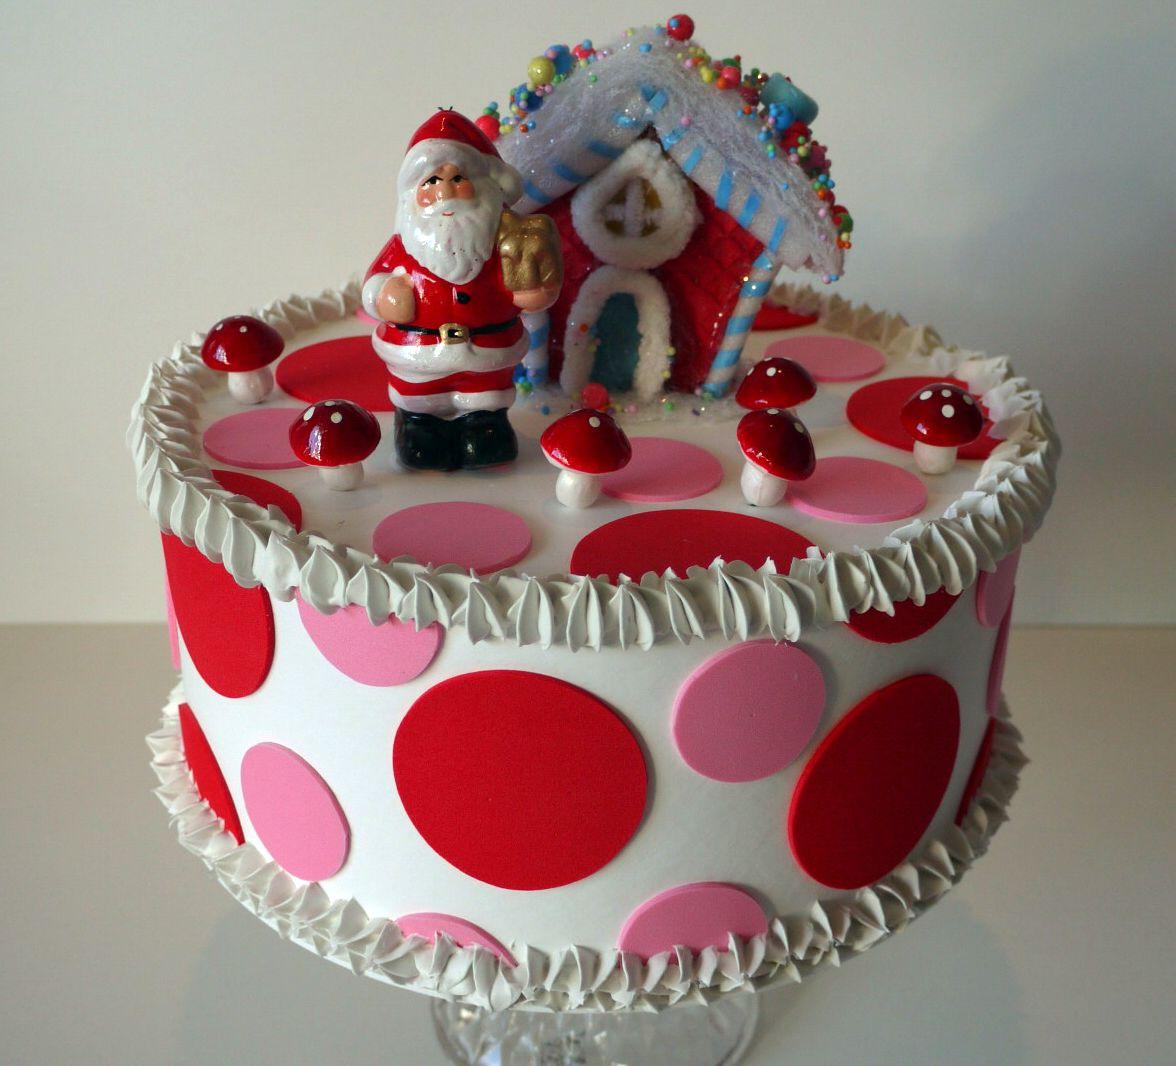 Christmas decorative cake - torta finta natalizia